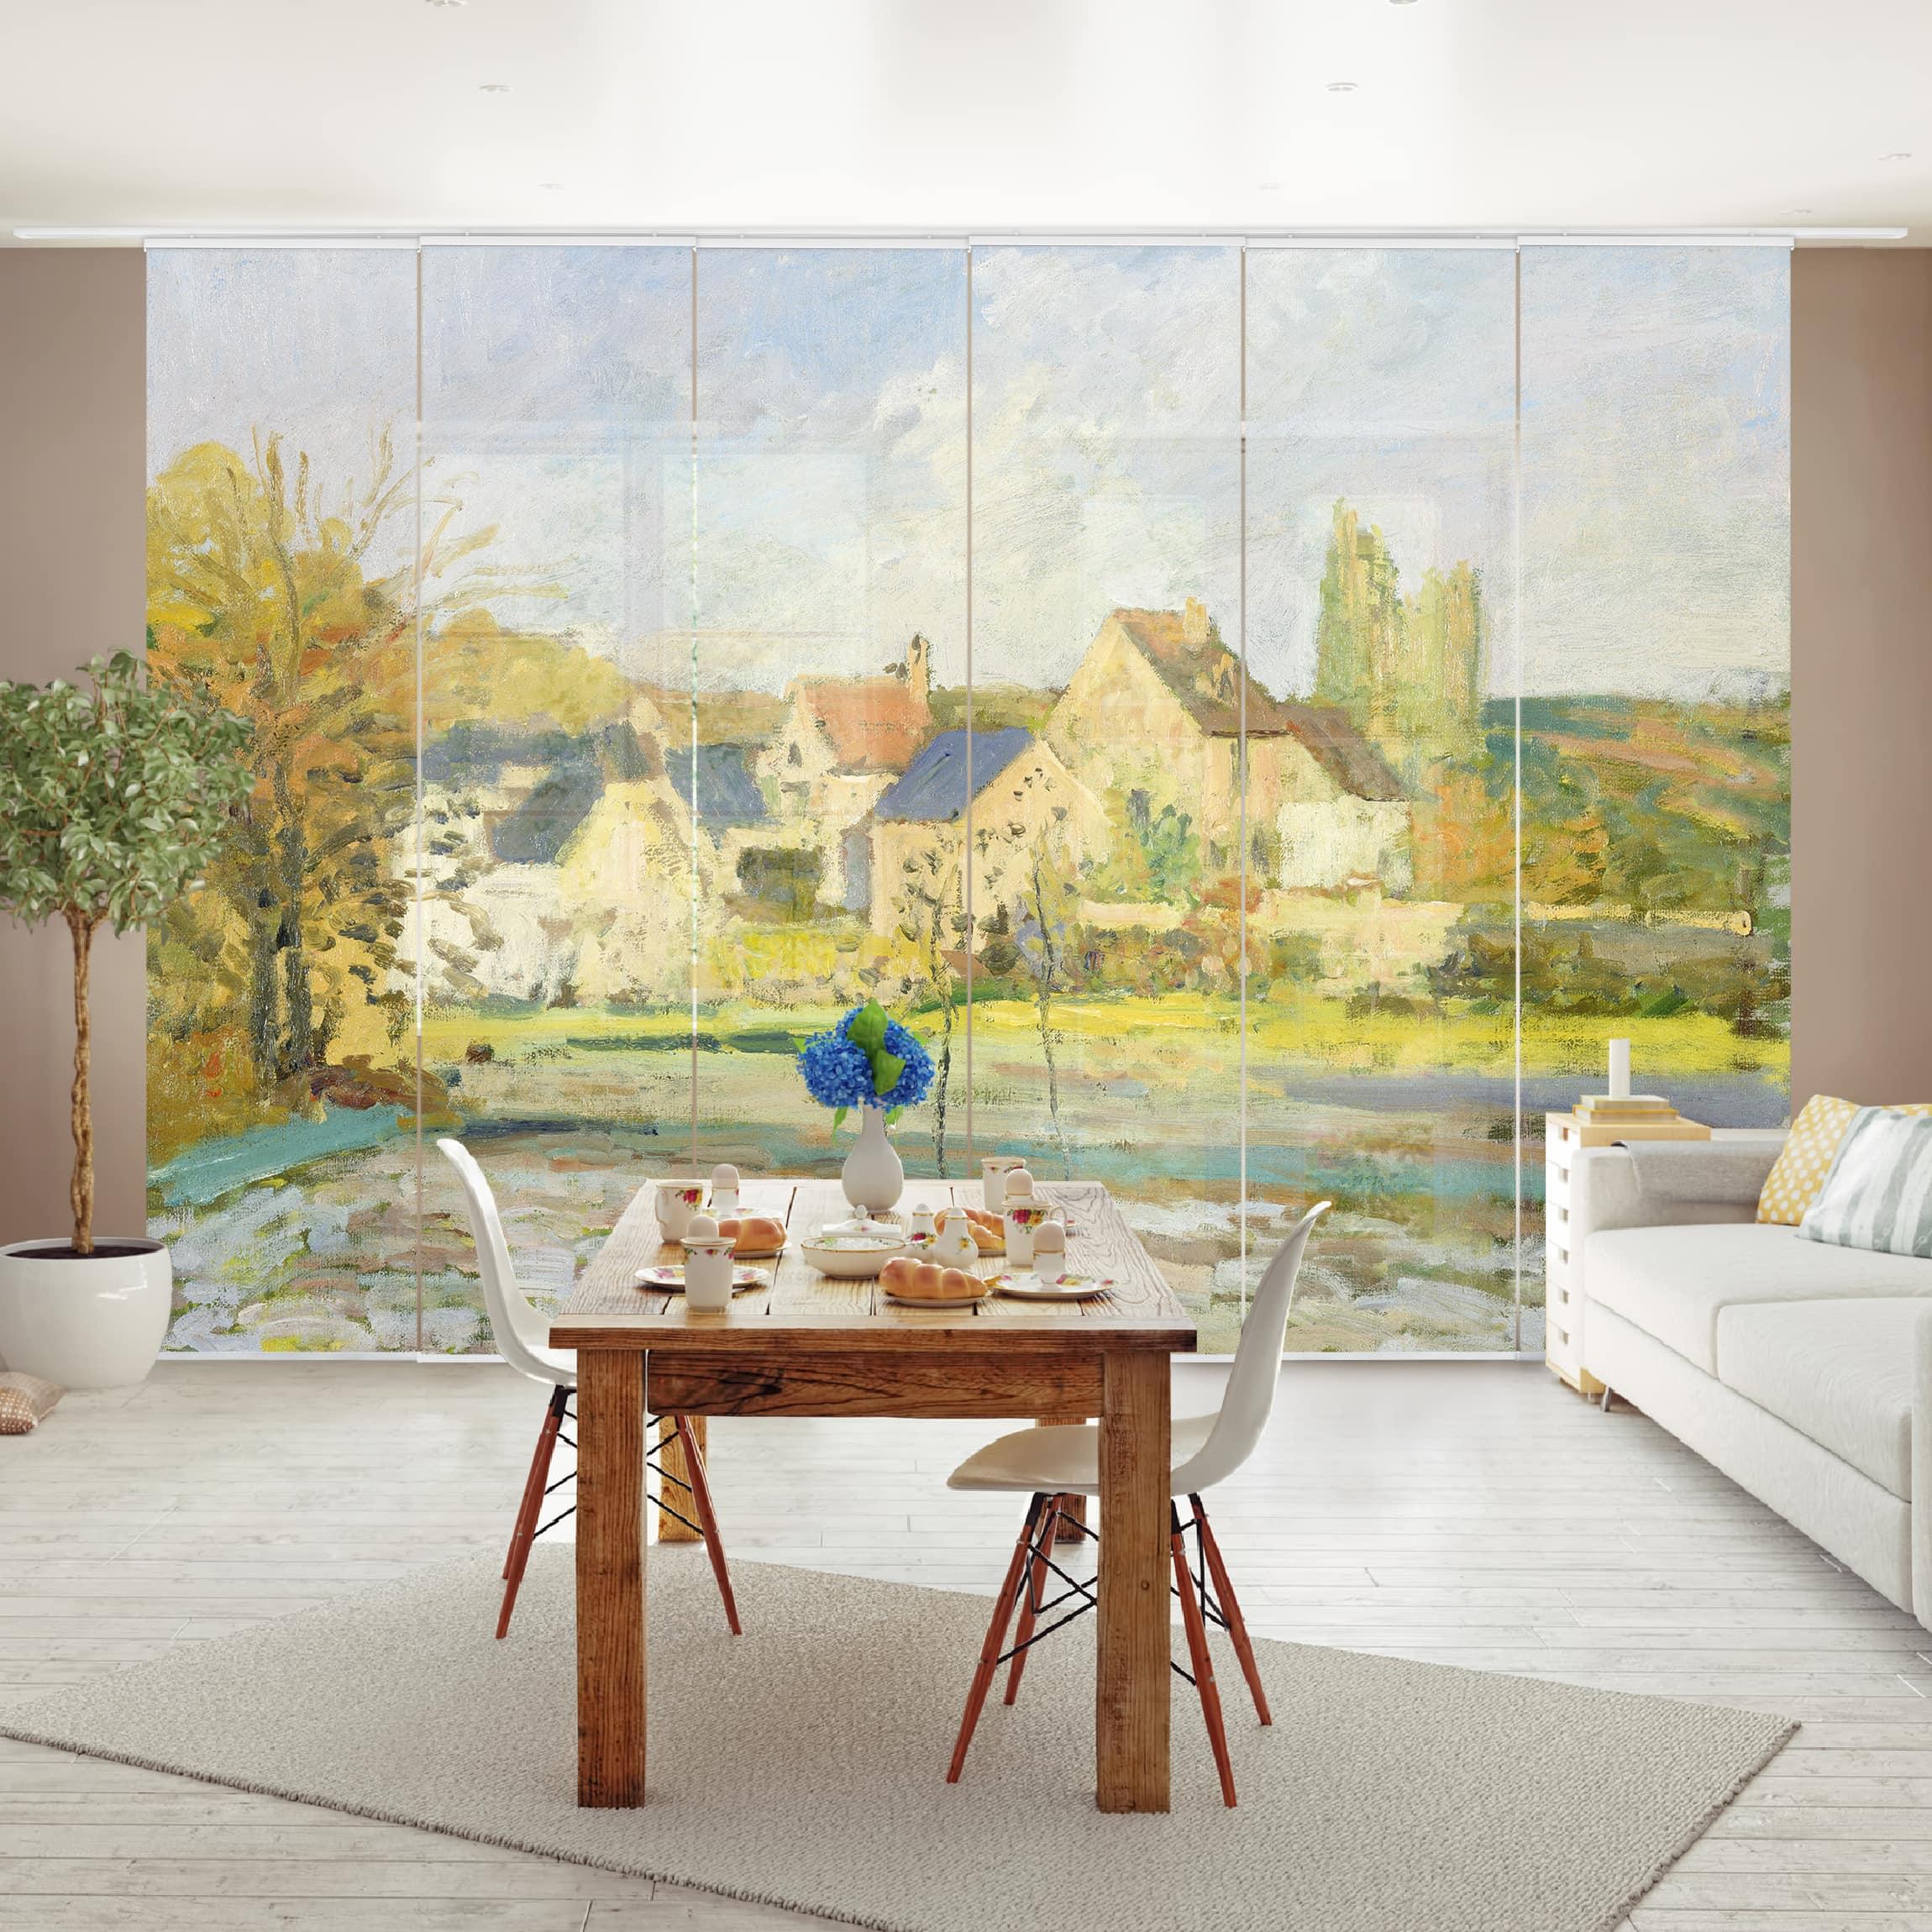 schiebegardinen set camille pissarro landschaft bei pontoise 6 fl chenvorh nge. Black Bedroom Furniture Sets. Home Design Ideas